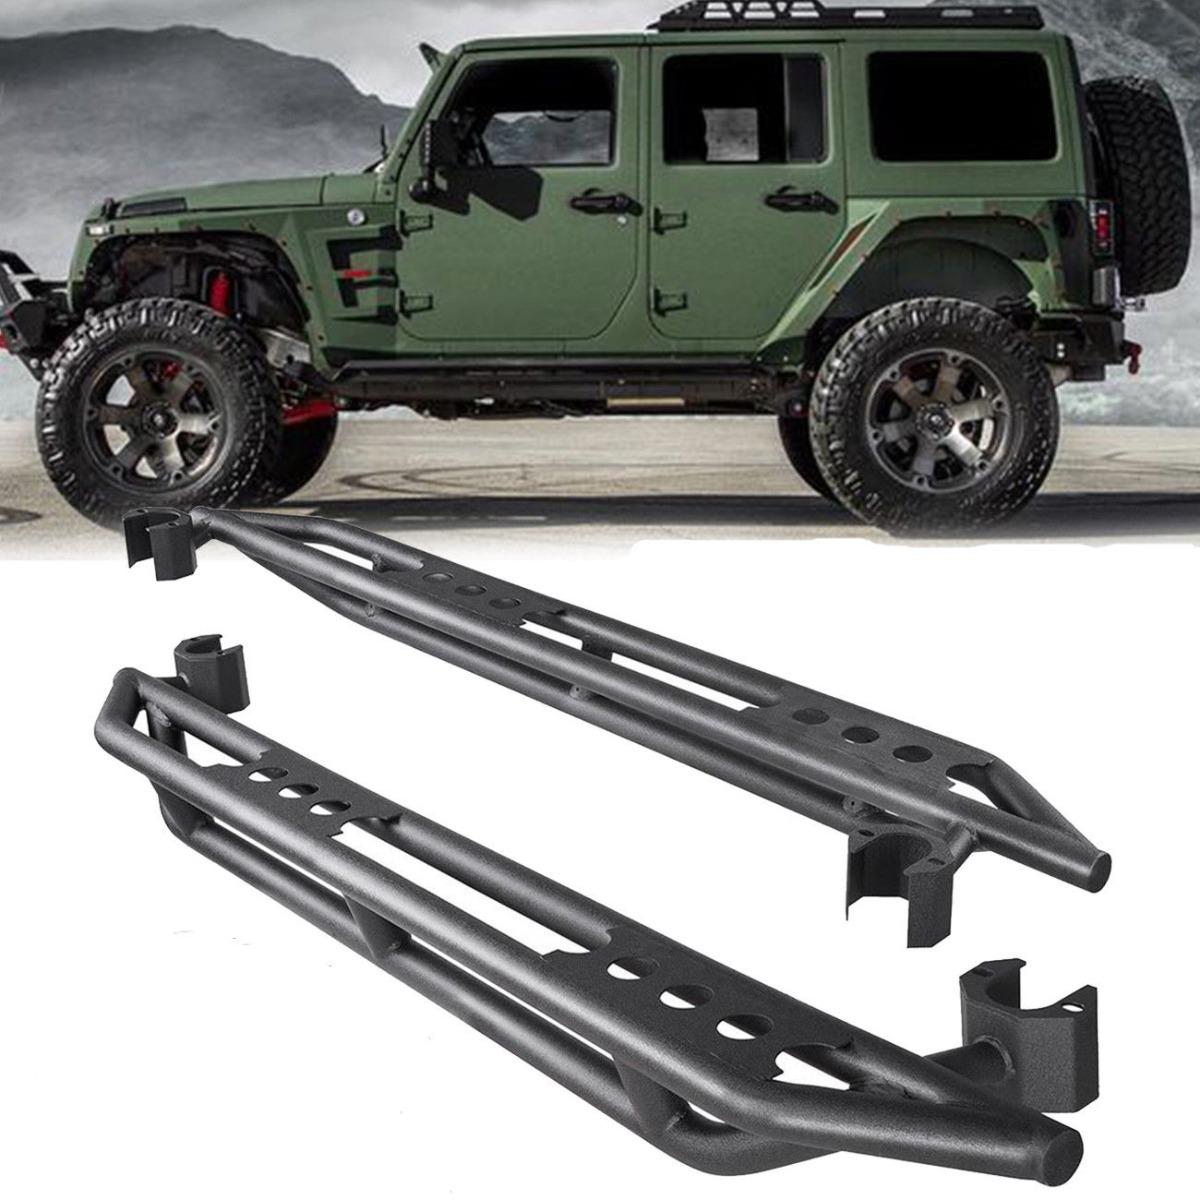 Par De Estribos Tubulares Jeep Wrangler 4 Puertas 2007